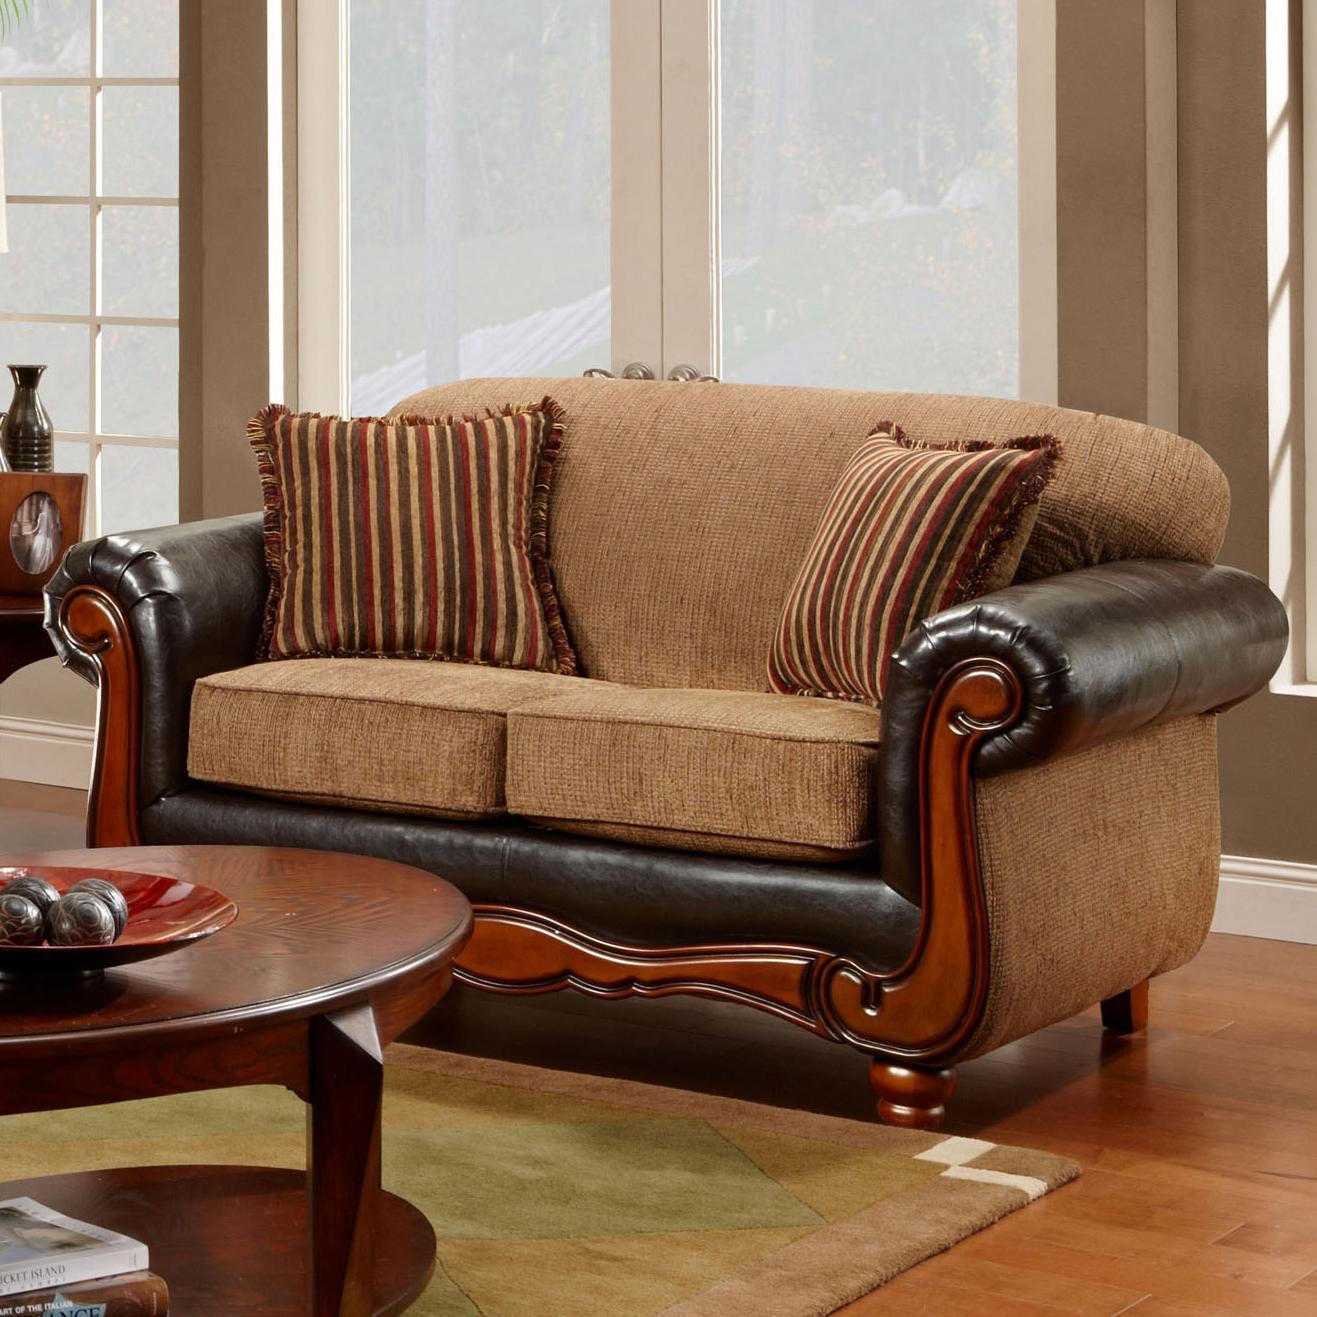 1030 Radar Mocha Loveseat by Washington Furniture at Lynn's Furniture & Mattress